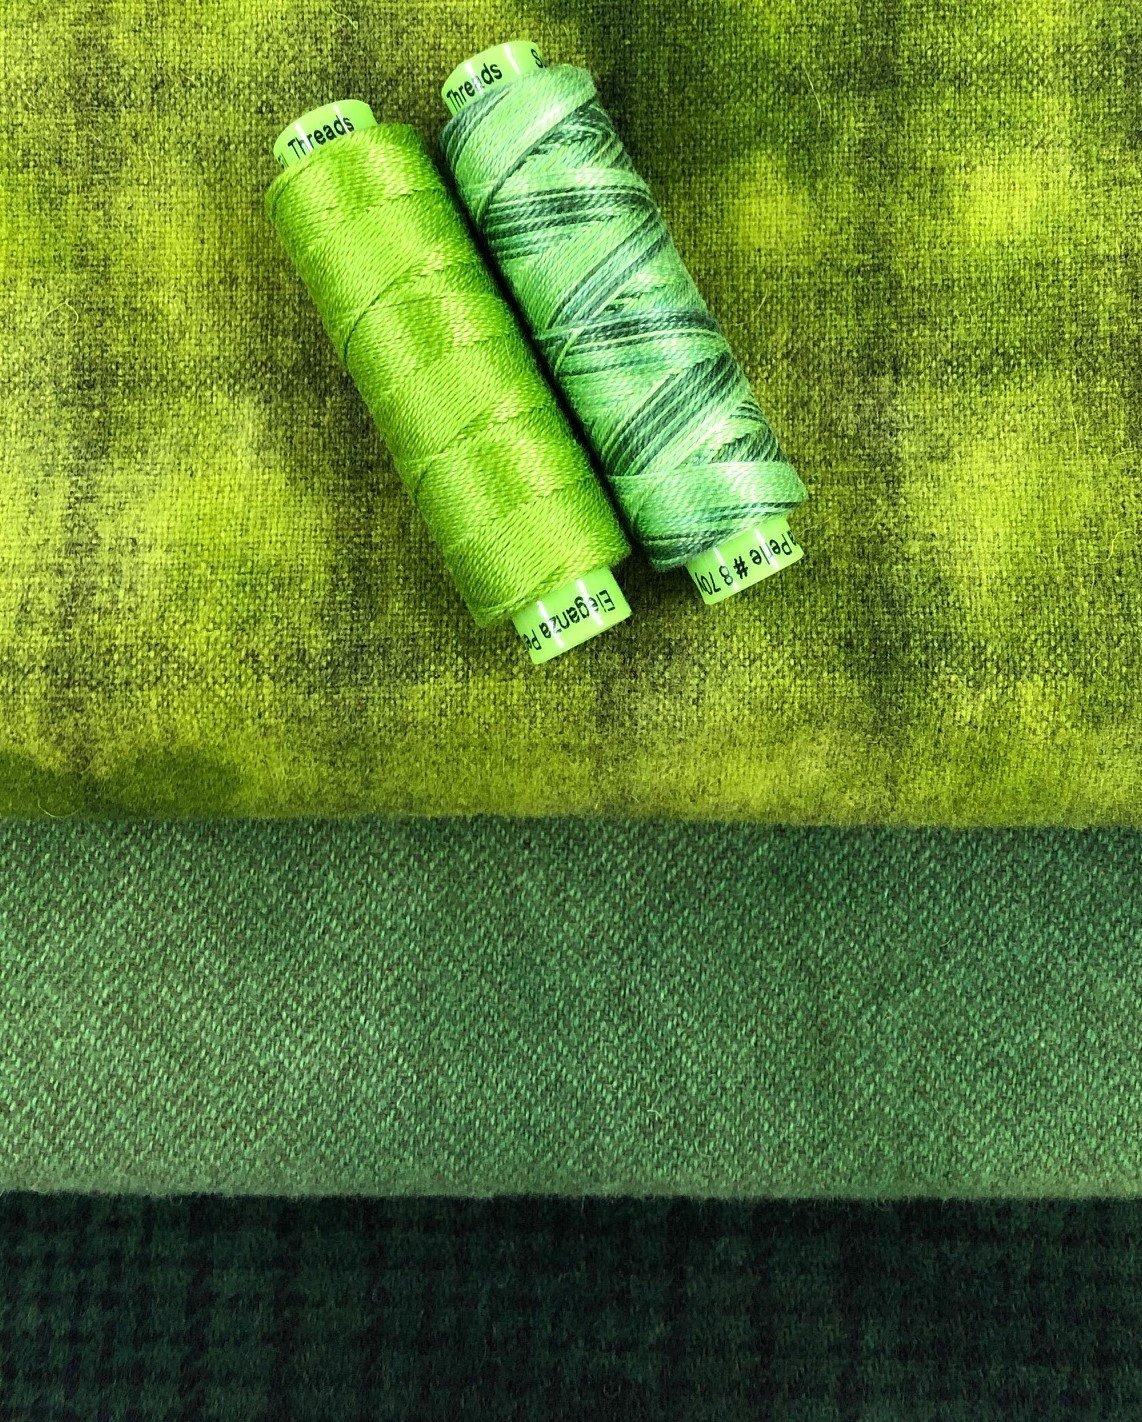 Green Thread and Wool Bundle